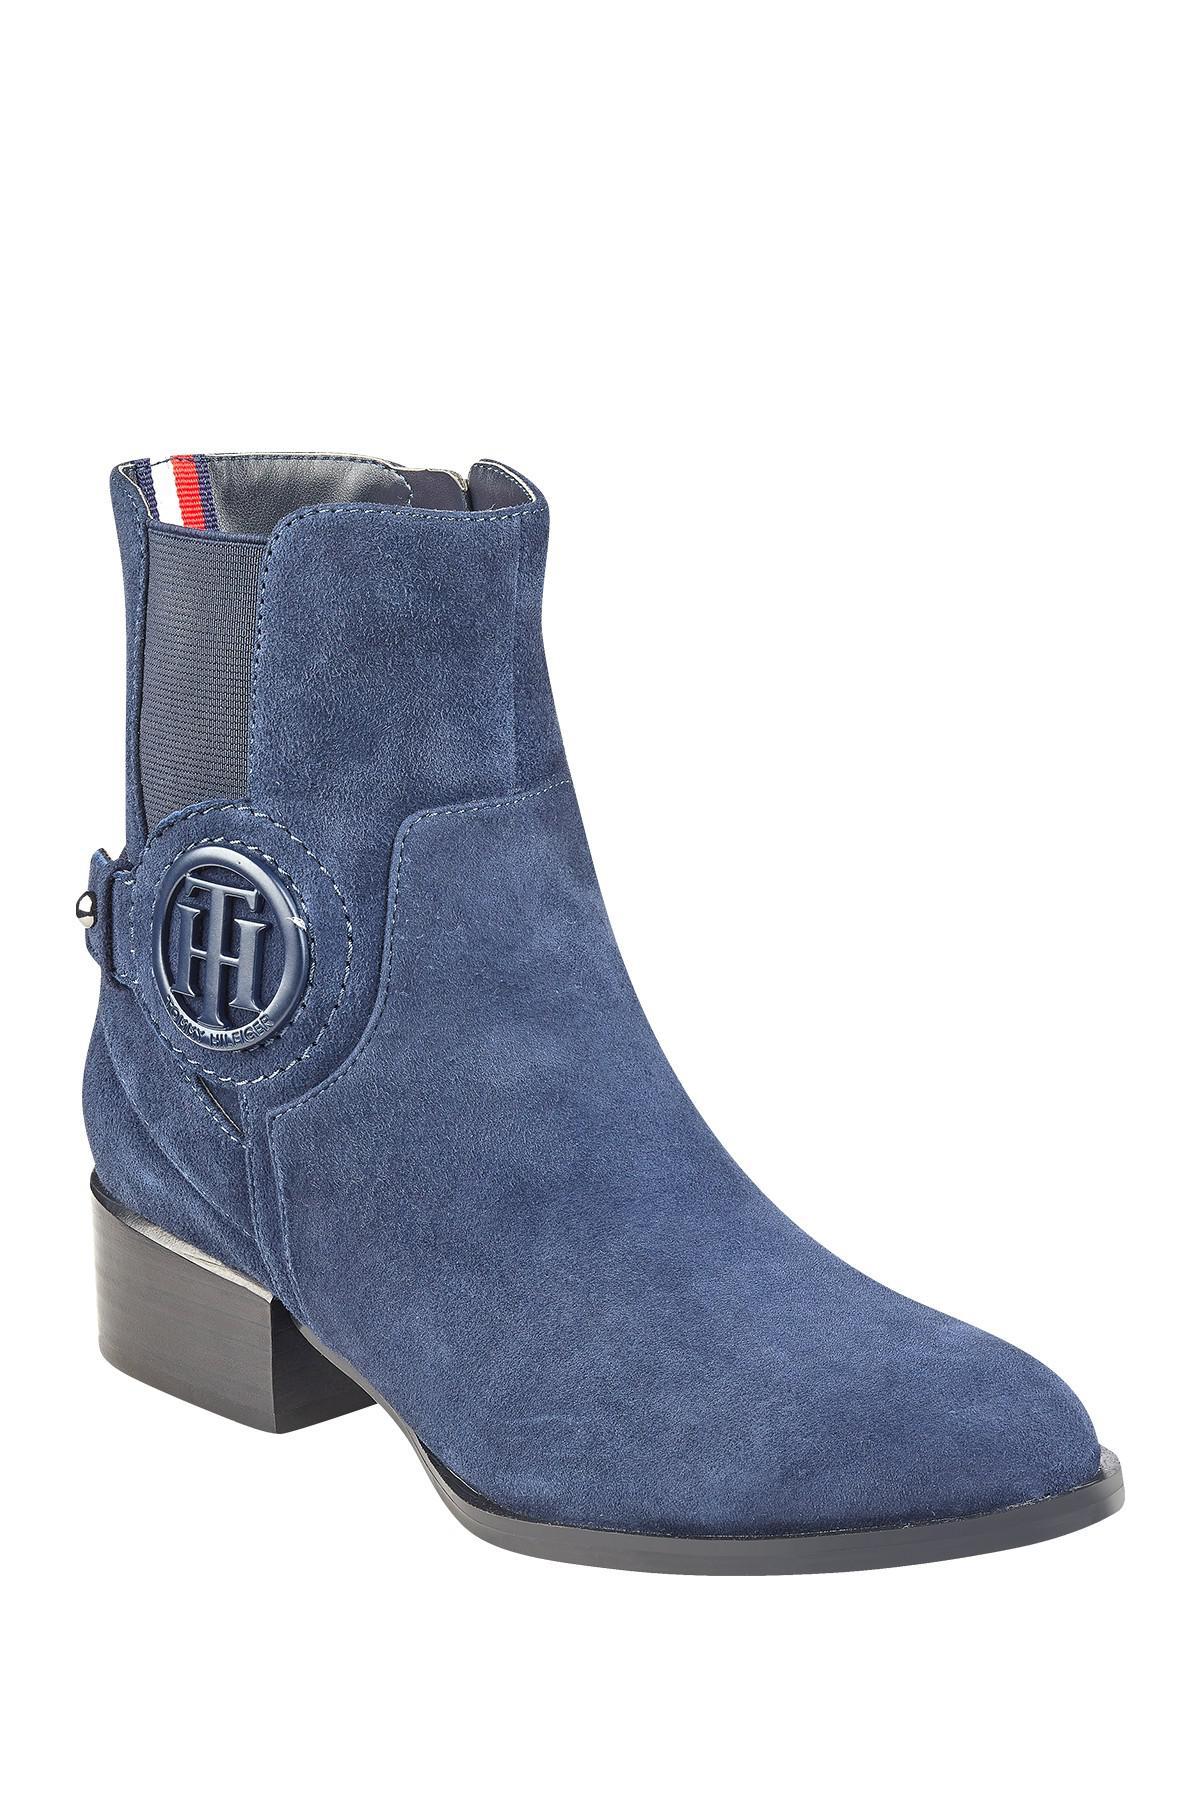 97e0b4490a0f Lyst - Tommy Hilfiger Mavrick Block Heel Ankle Bootie in Blue